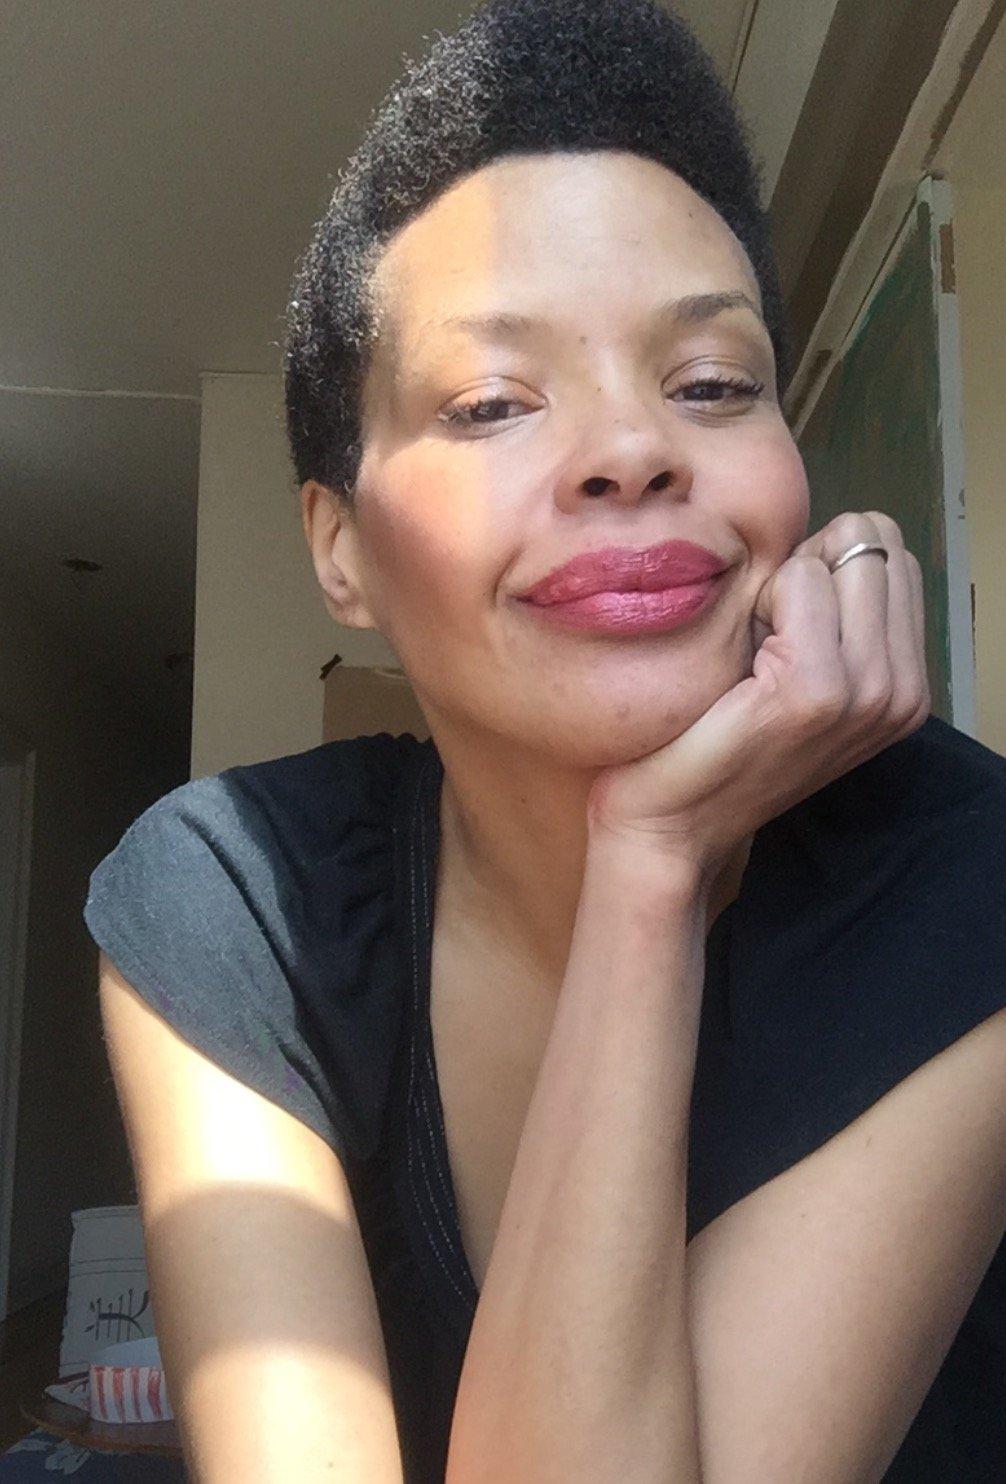 Light Skin Tears: A Youtube Channel for Light-Skin & Bi-Racial Women That's Stirring the Pot